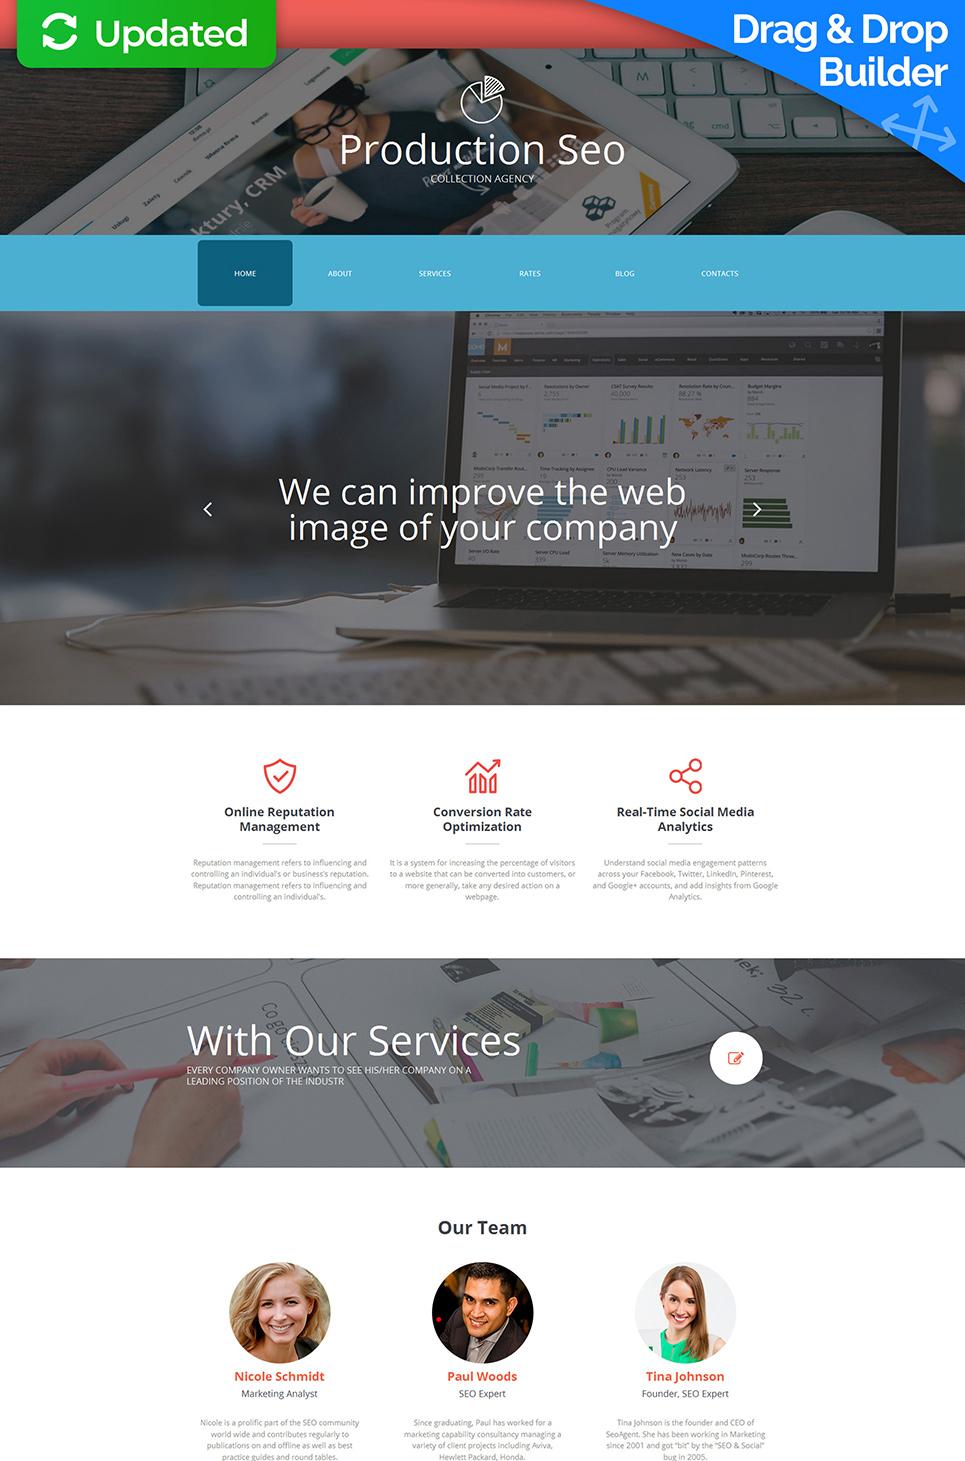 Production Seo MotoCMS 3 Responsive Website Template - image